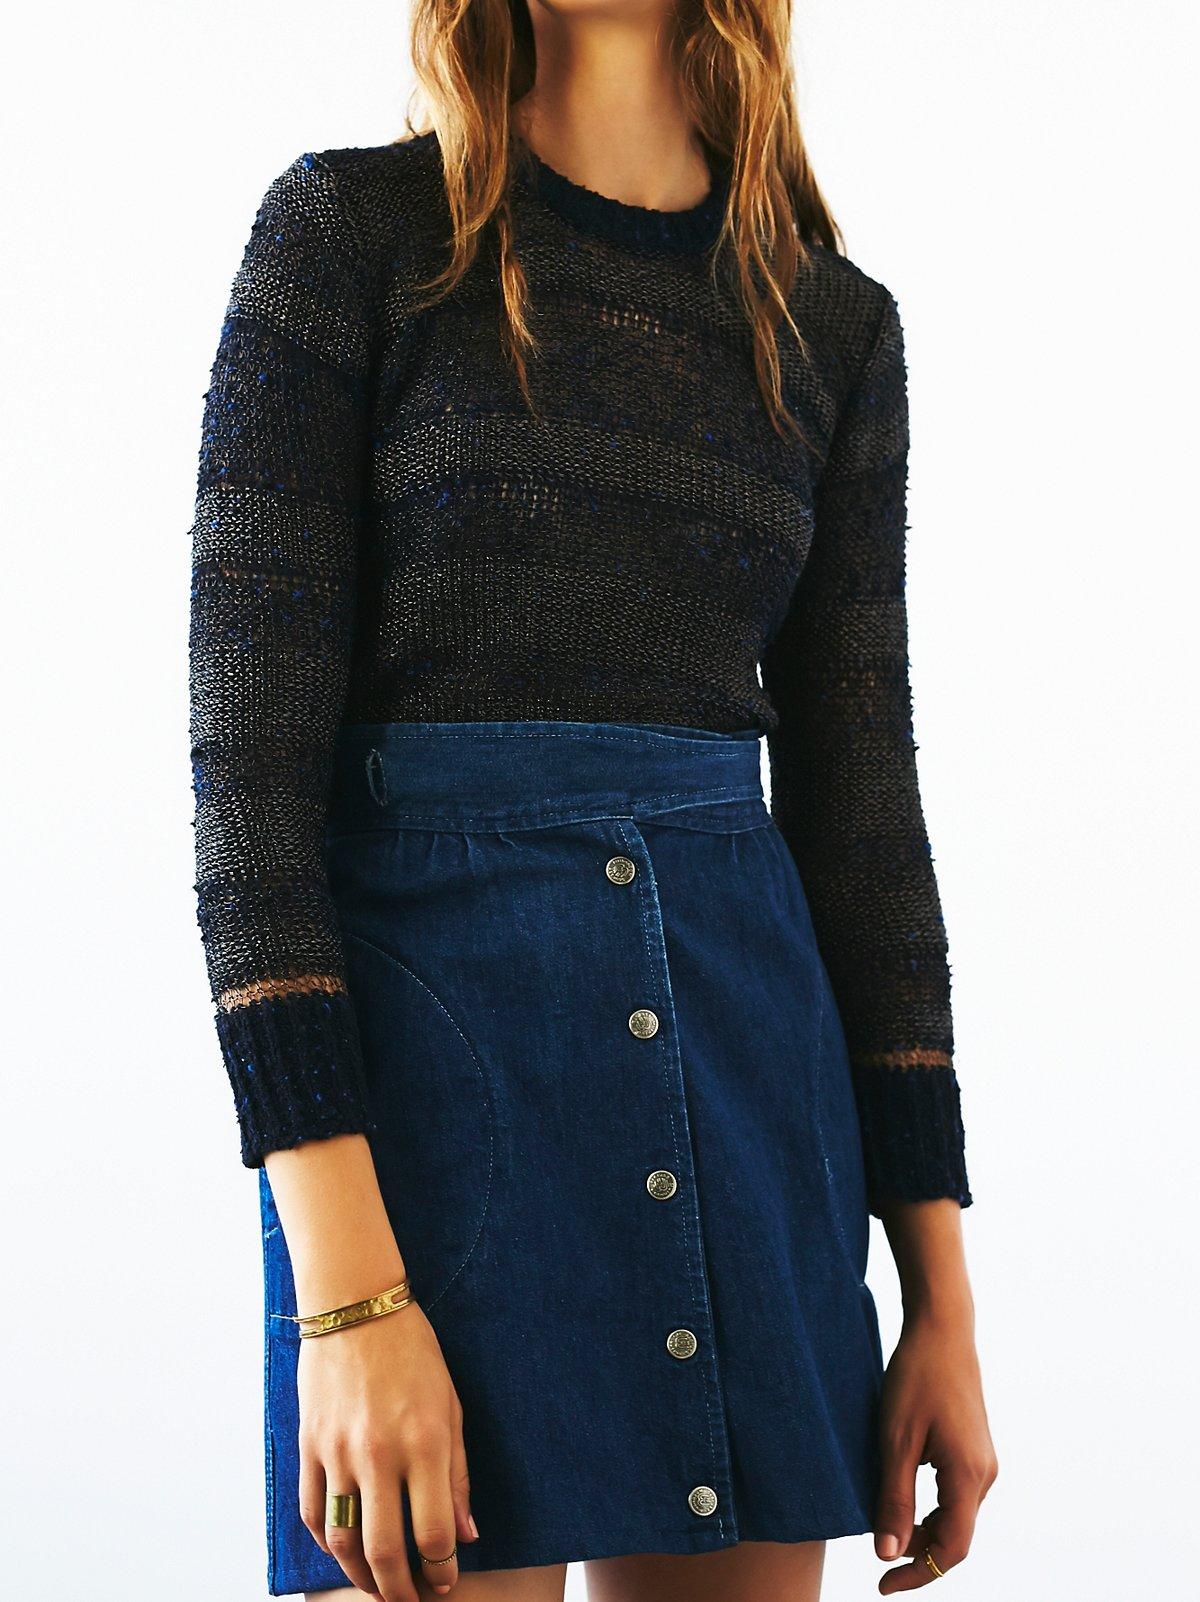 Vintage 1970s Blue Knit Top